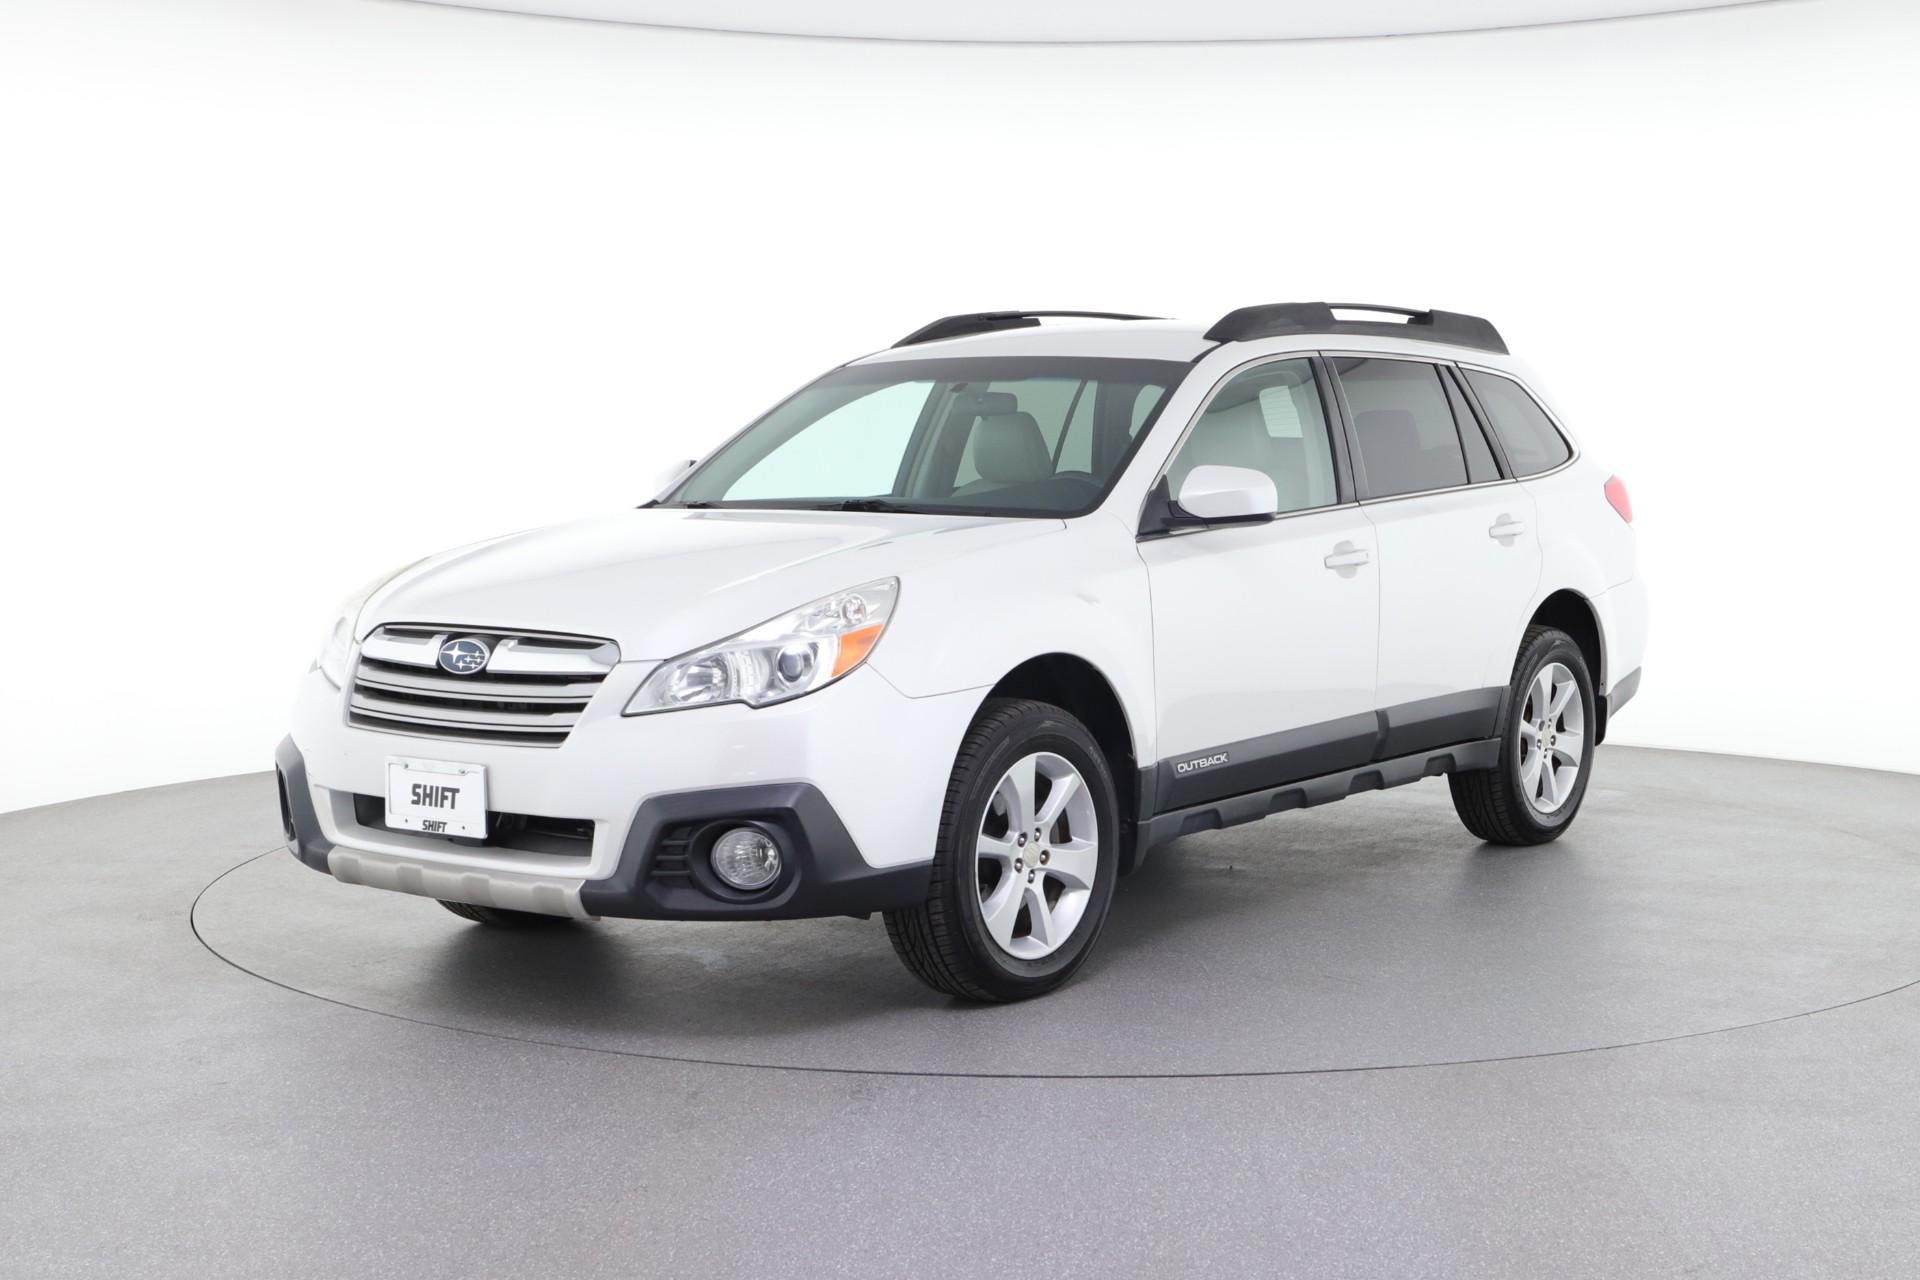 2014 Subaru Outback 2.5i Premium (from $13,950)